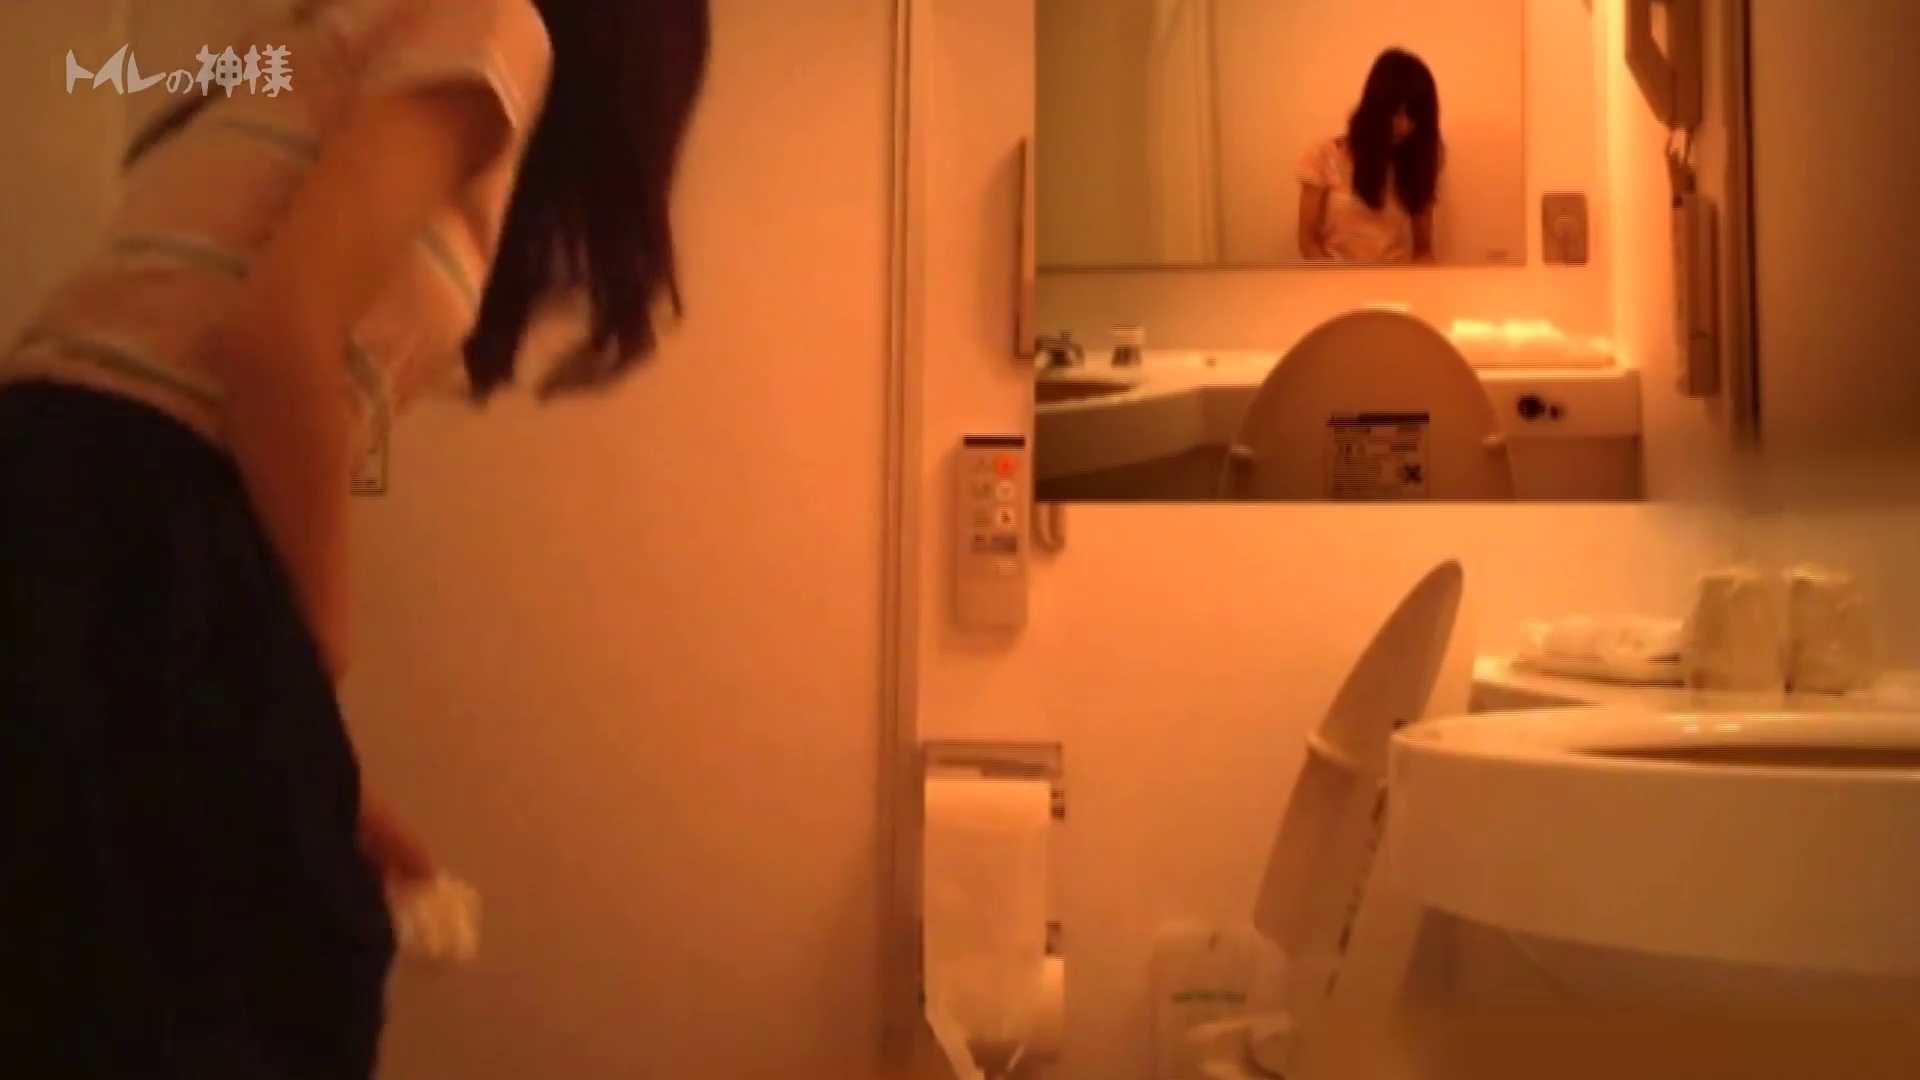 Vol.04 女子大生のトイレ恥態 OLハメ撮り  104Pix 73